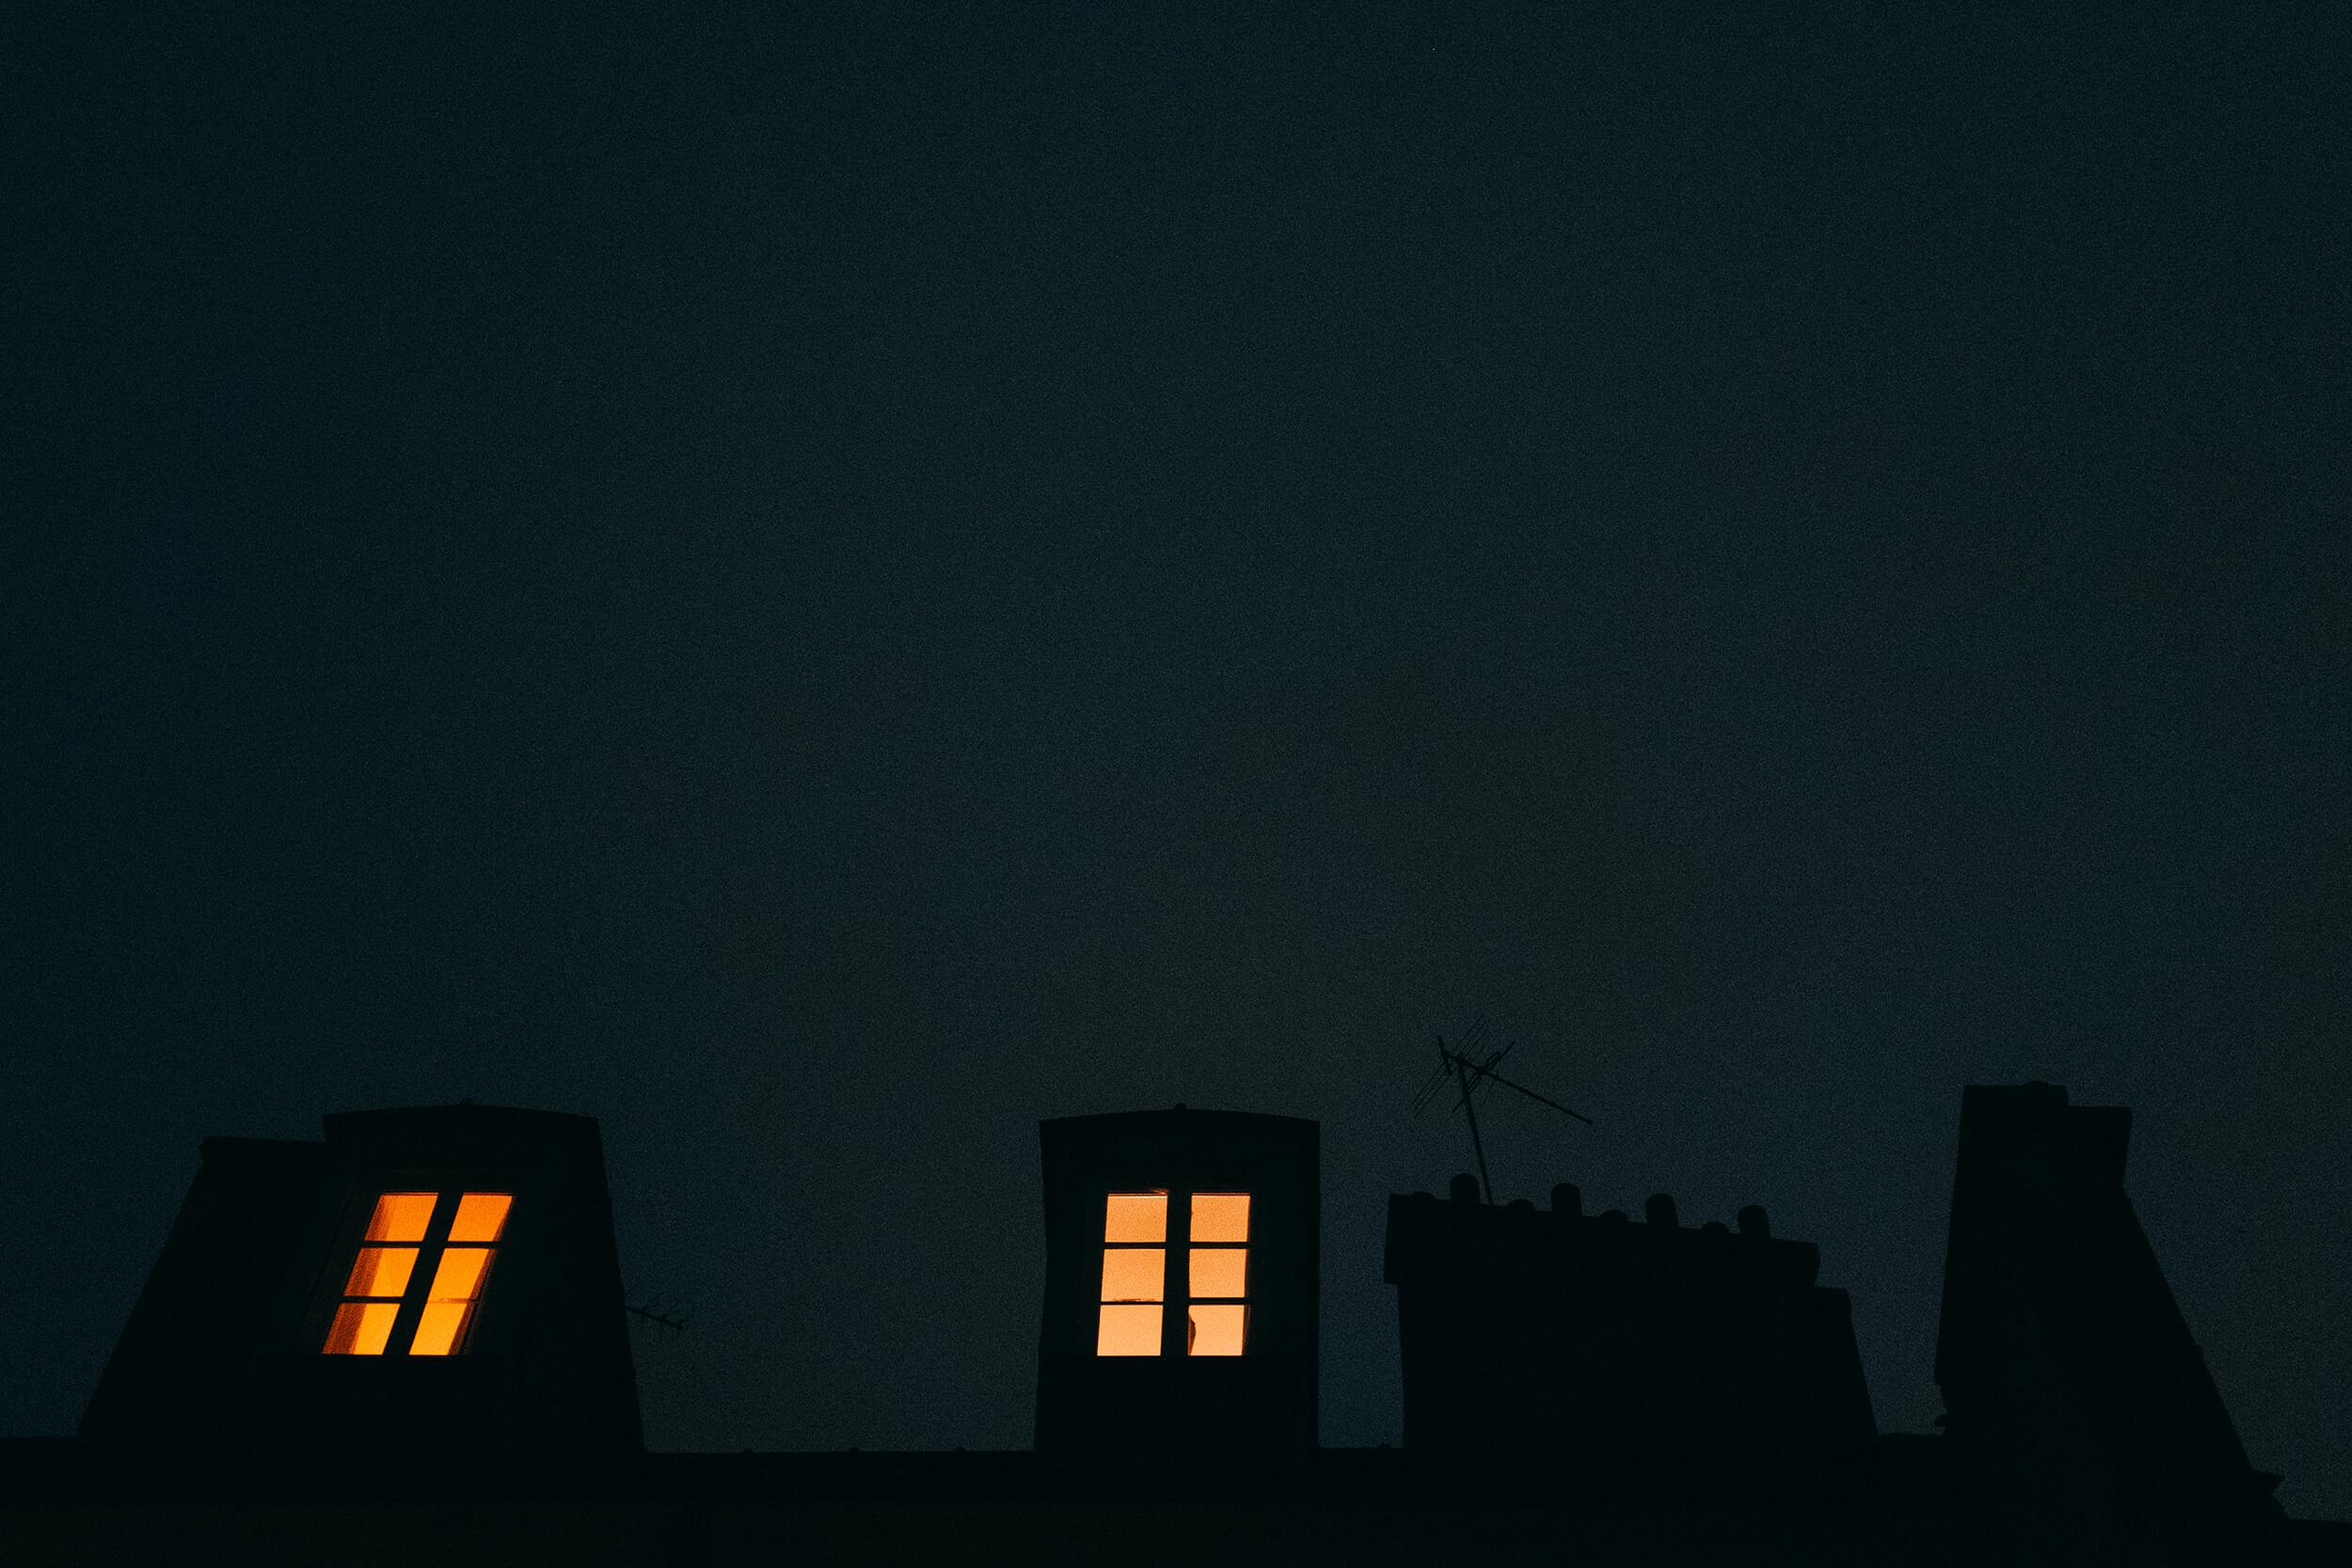 strangers-windows-paris-night.jpg